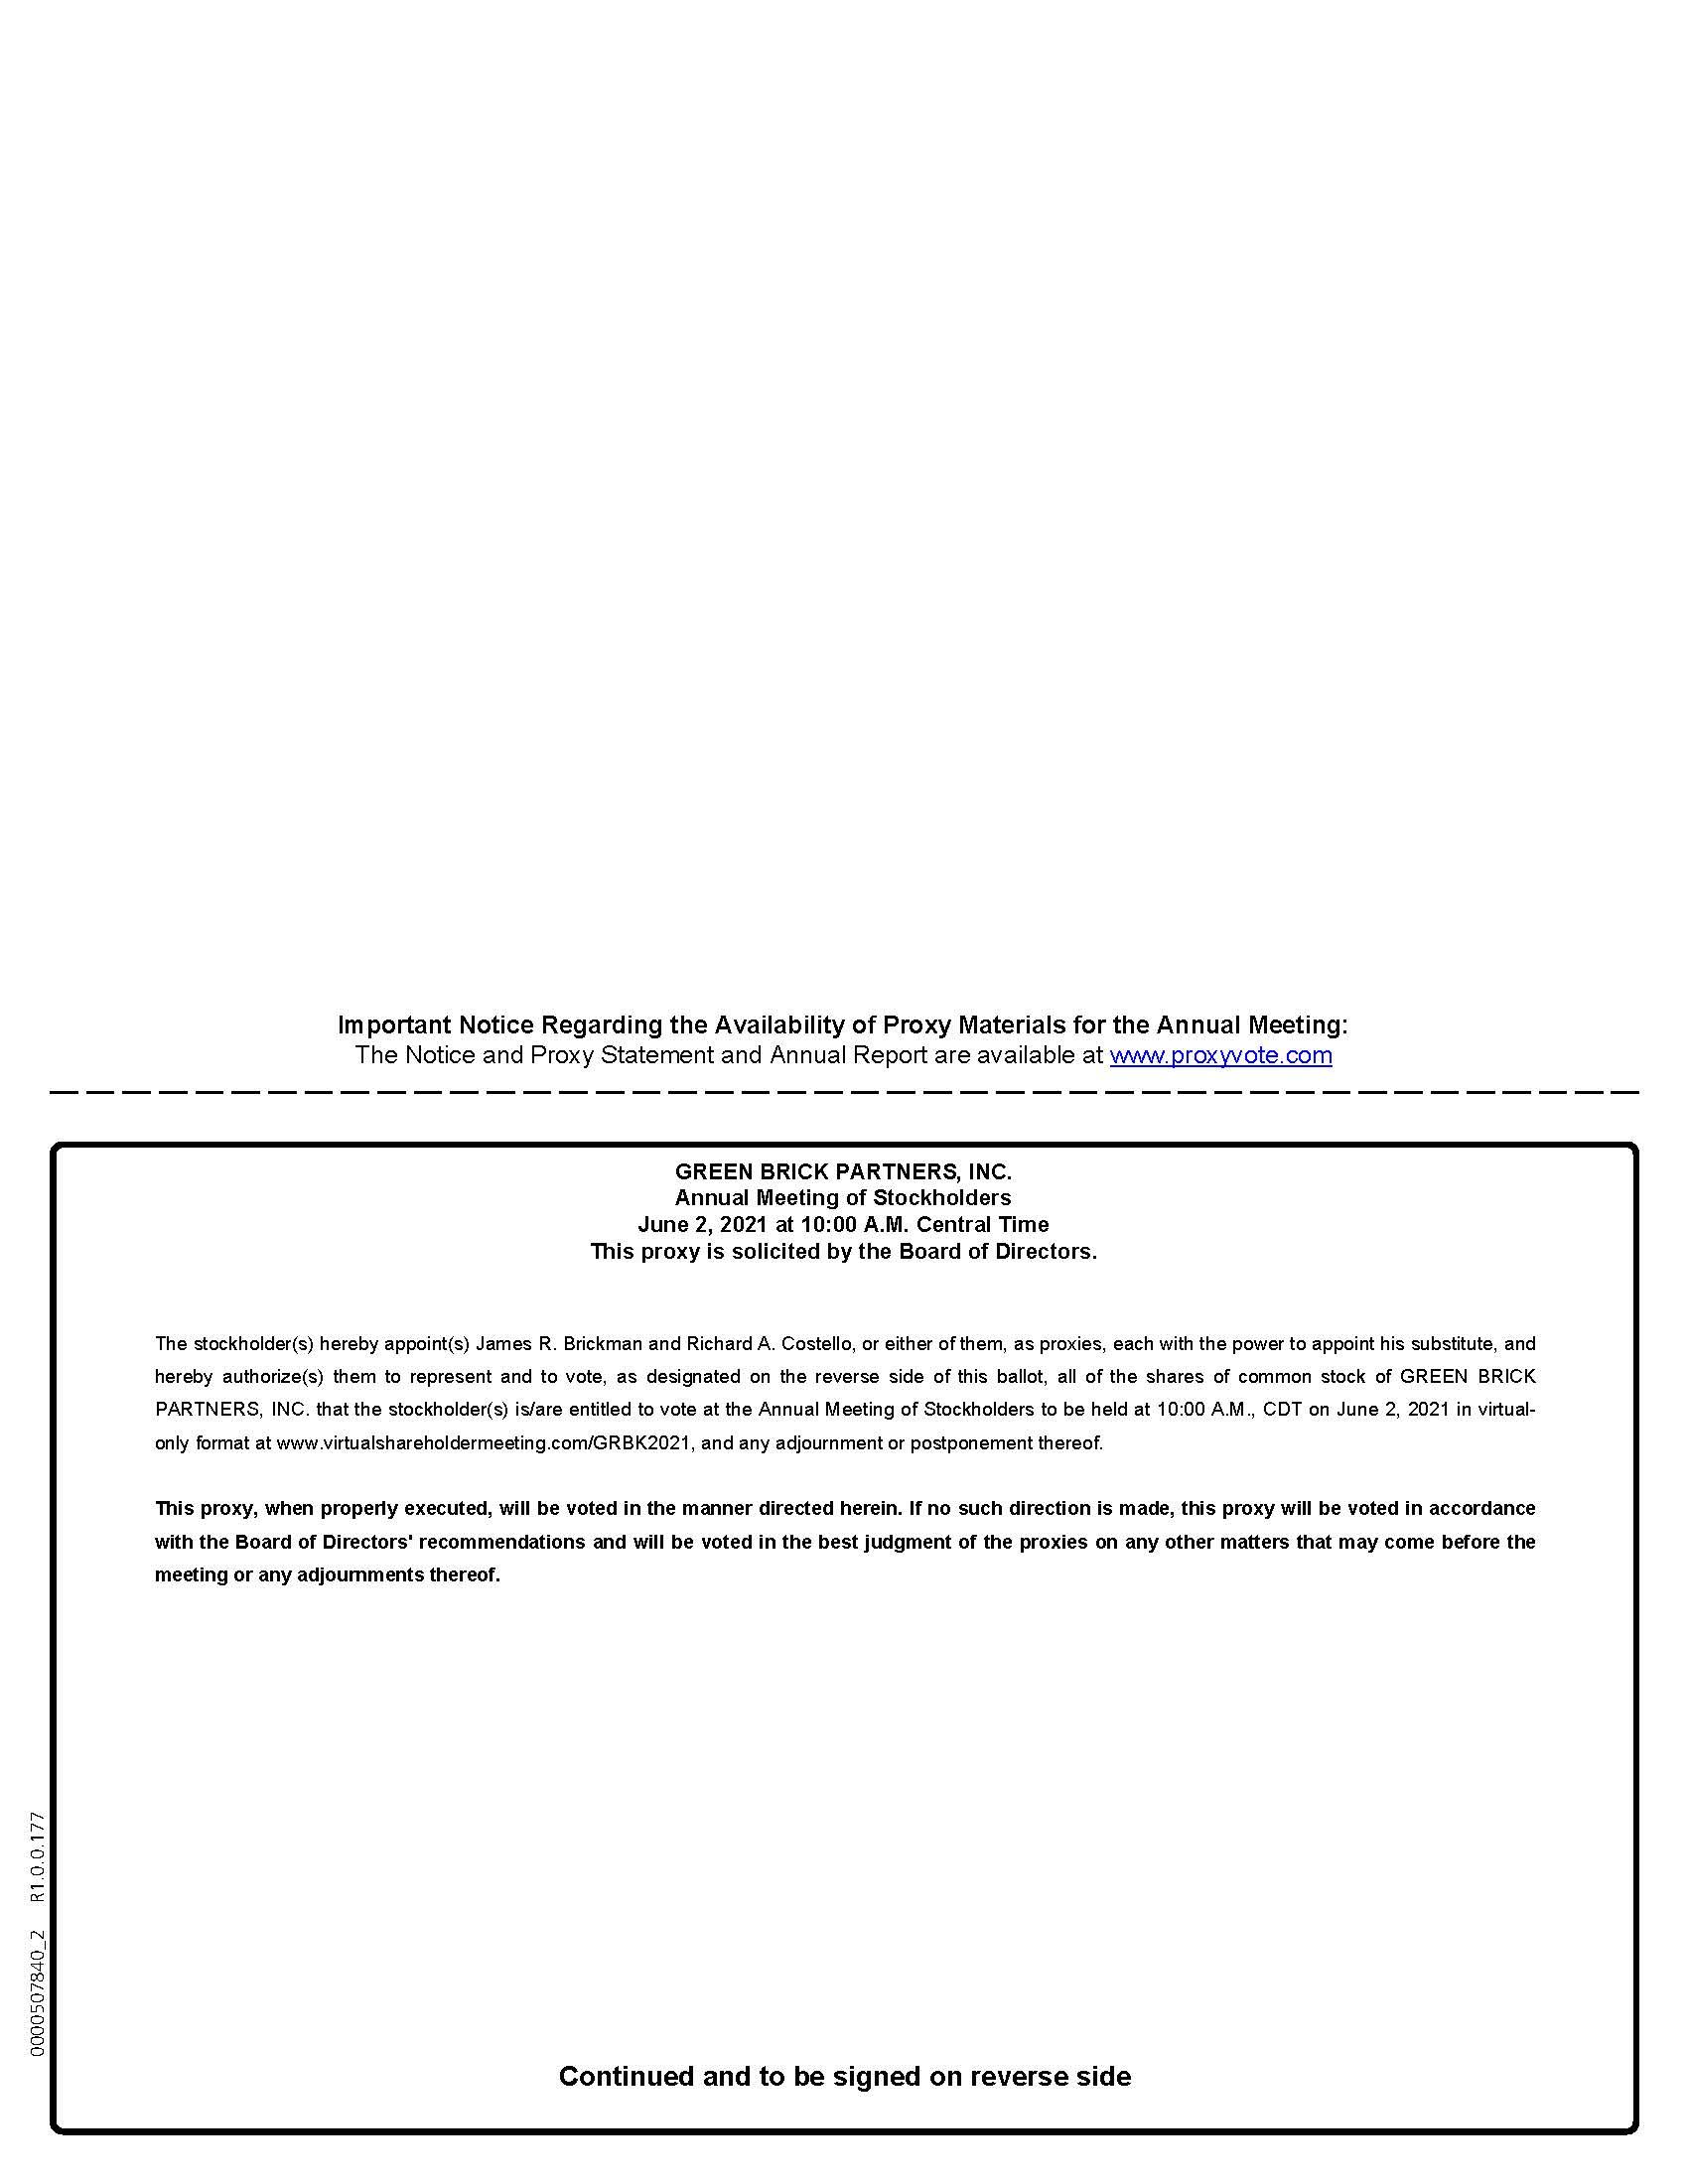 FINALVOTINGCARD_PAGEX21.JPG